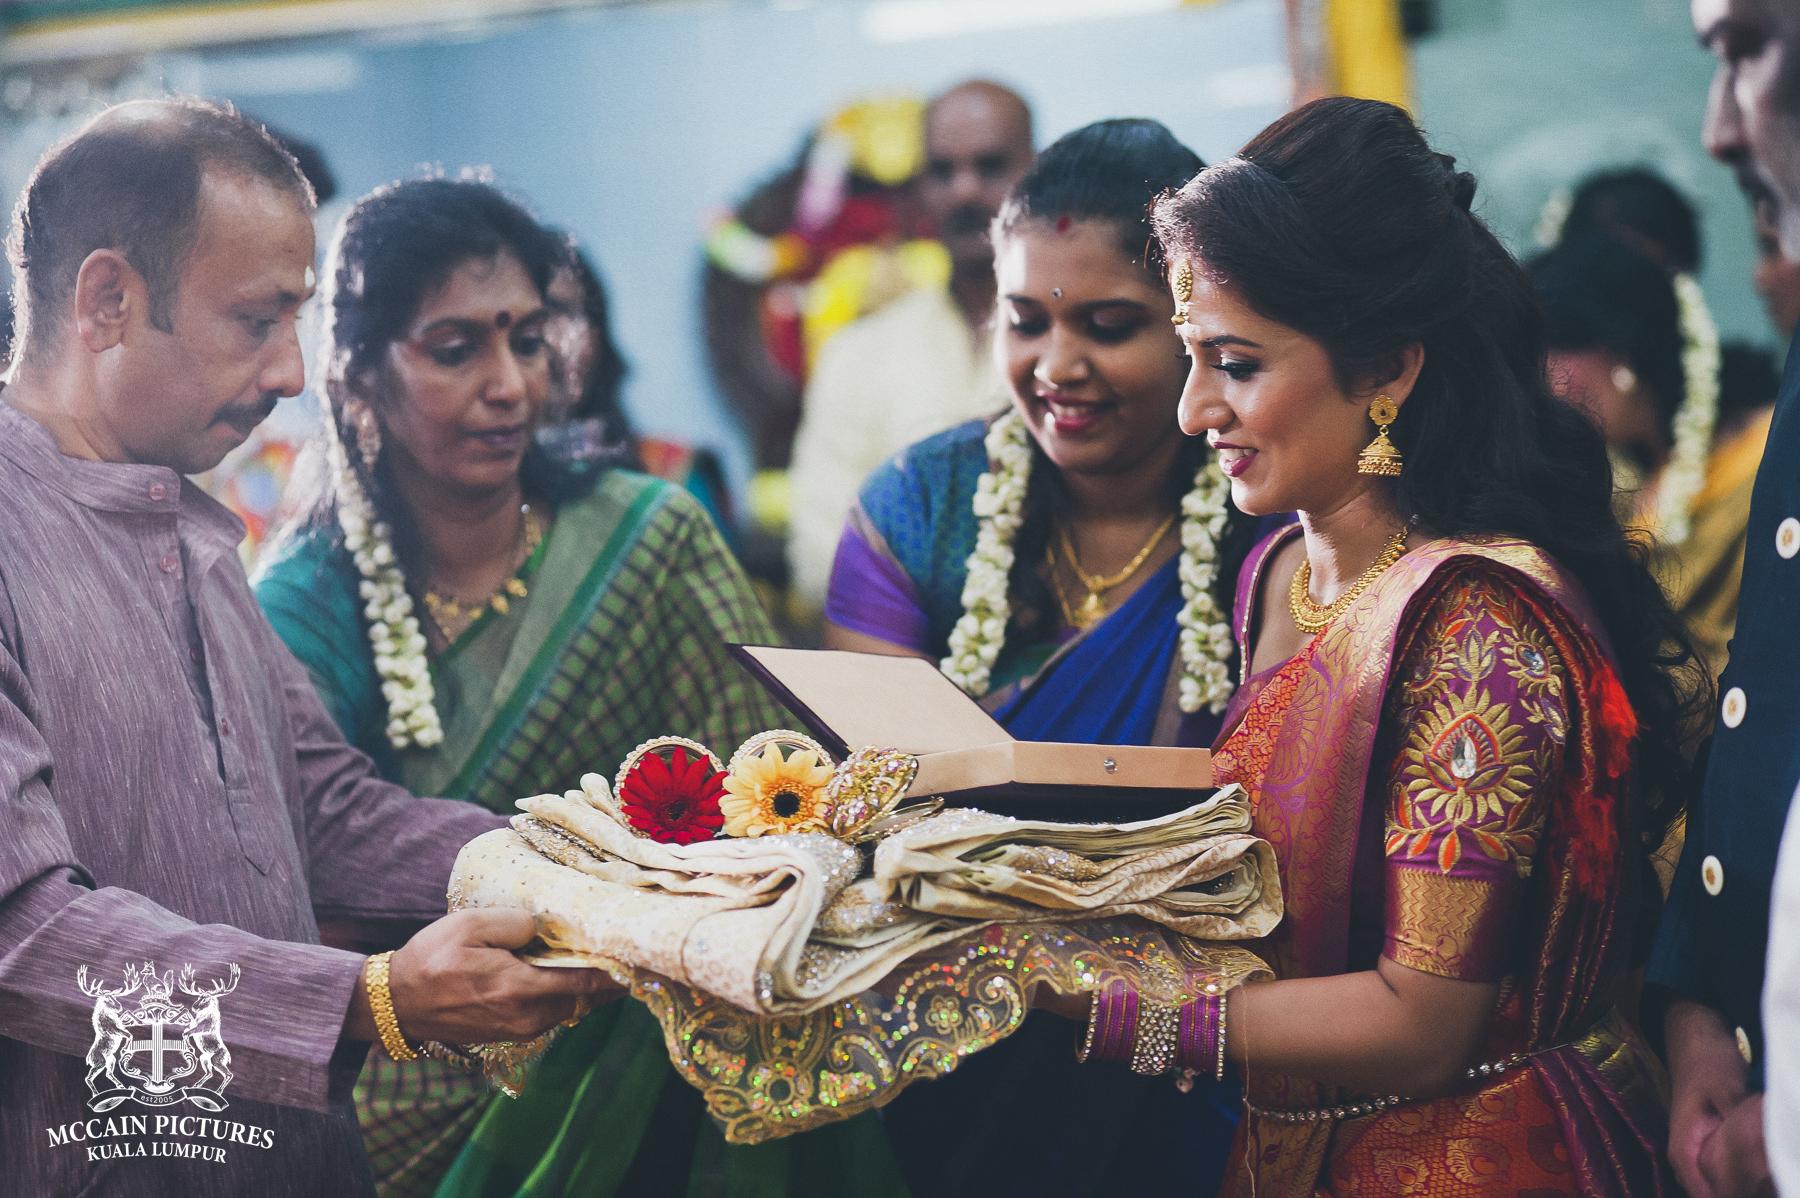 mccain goh mccain pictures wedding photographer malaysia-360